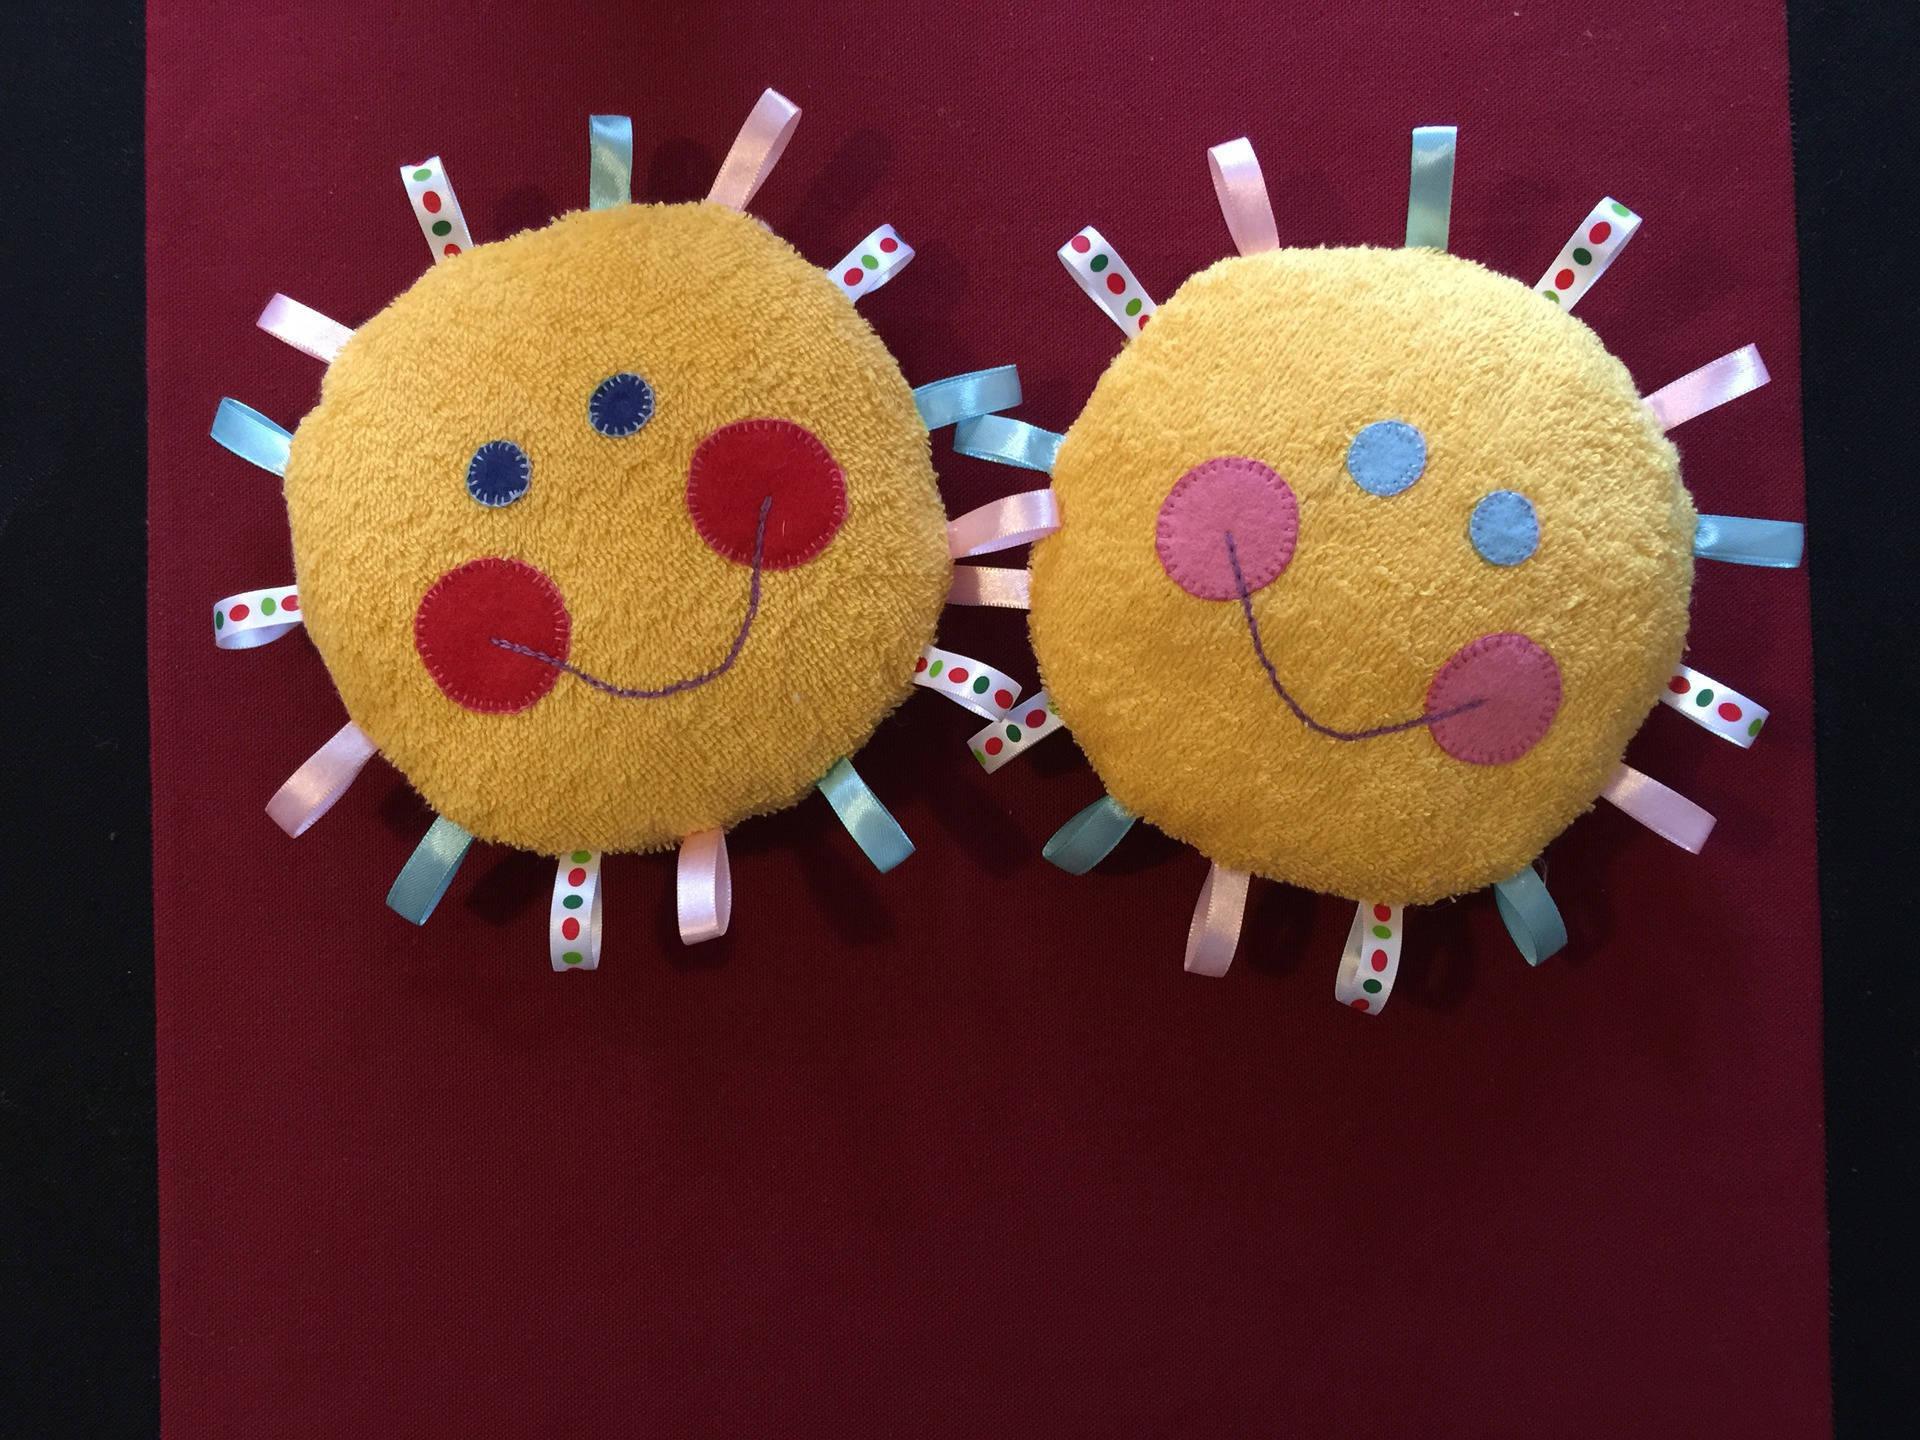 Hochet doudou soleil eponge jaune rubans multicolores